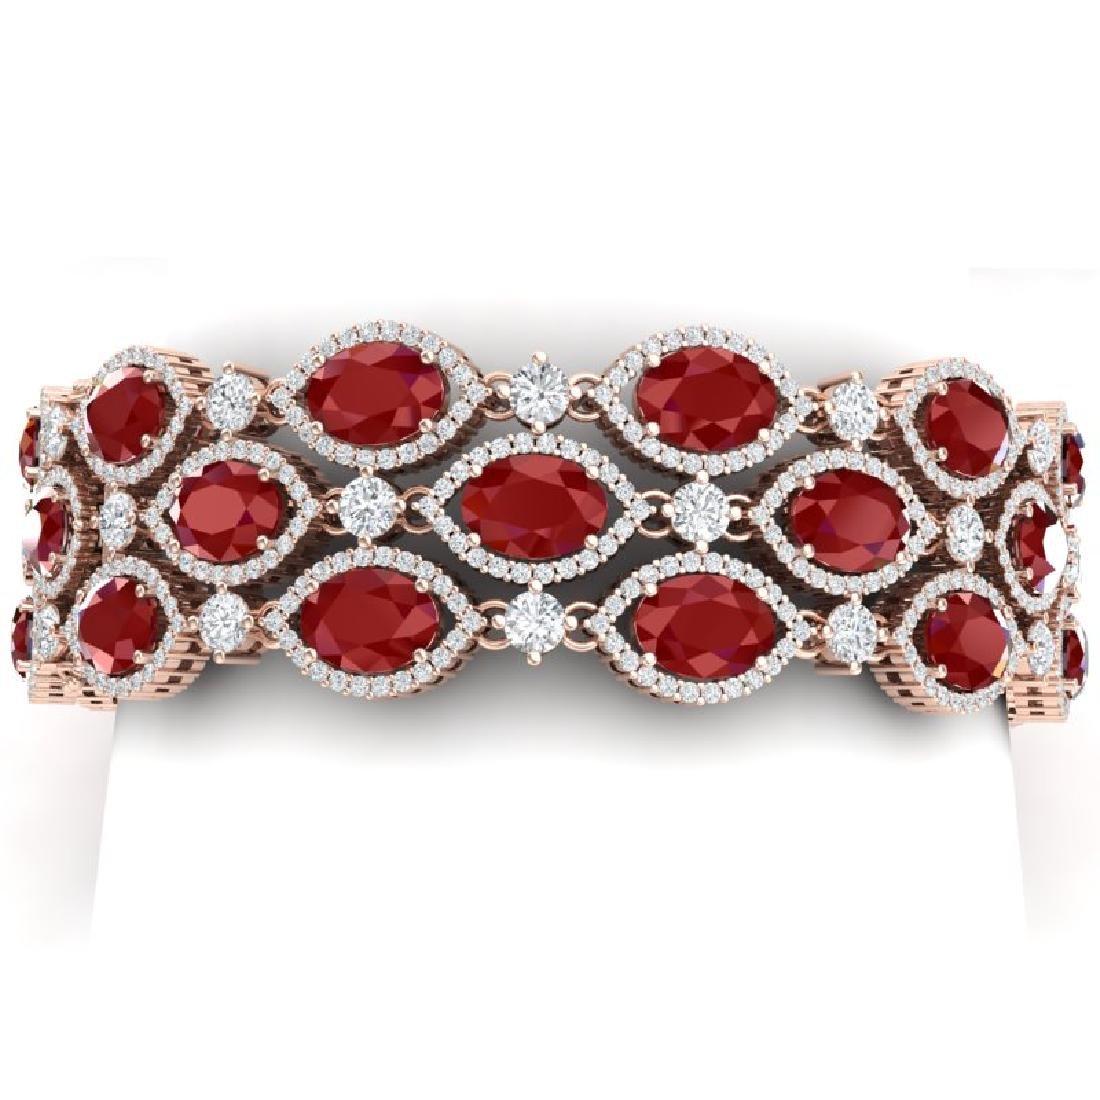 47.84 CTW Royalty Ruby & VS Diamond Bracelet 18K Rose